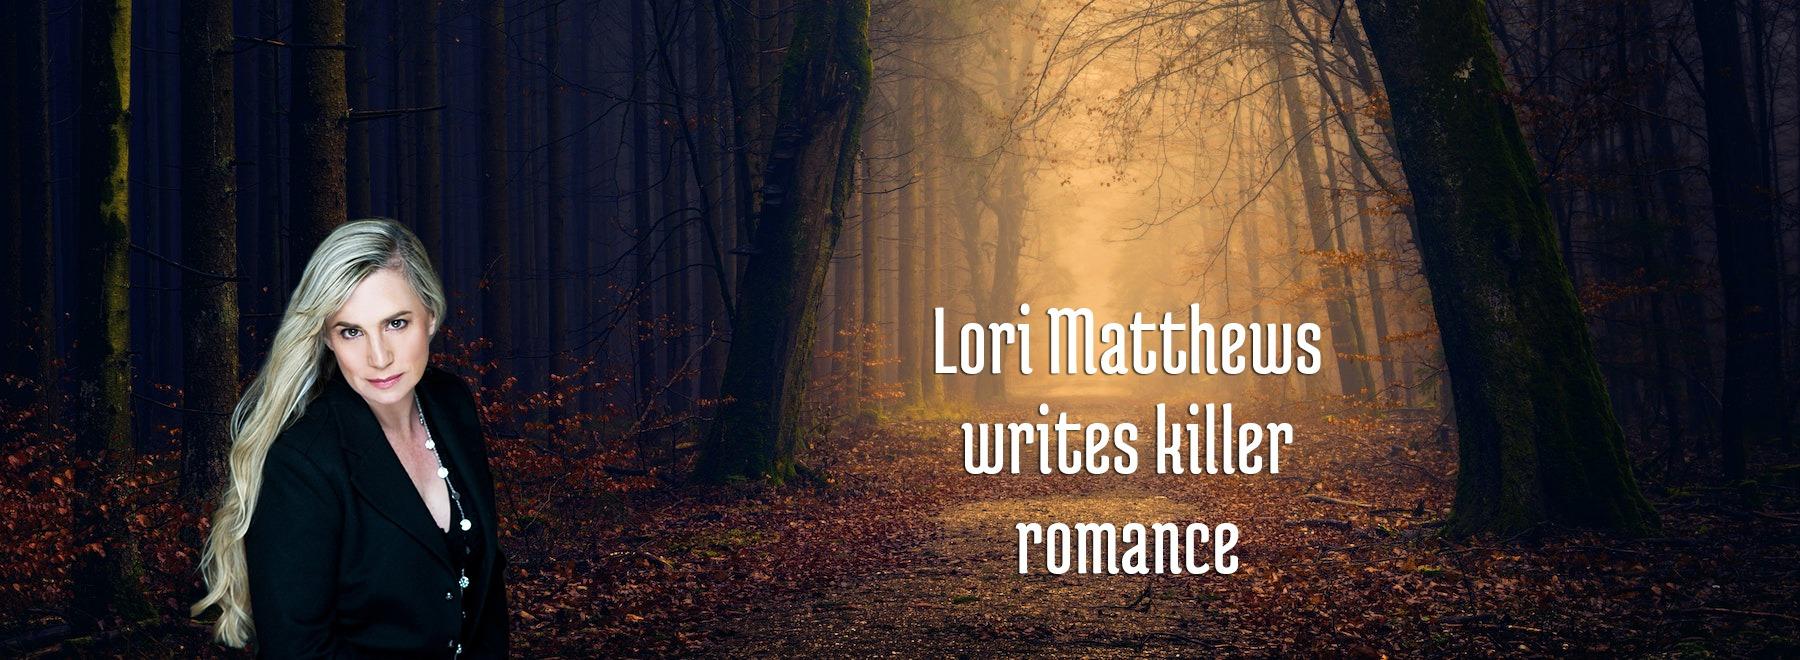 Lori Matthews writes killer romance